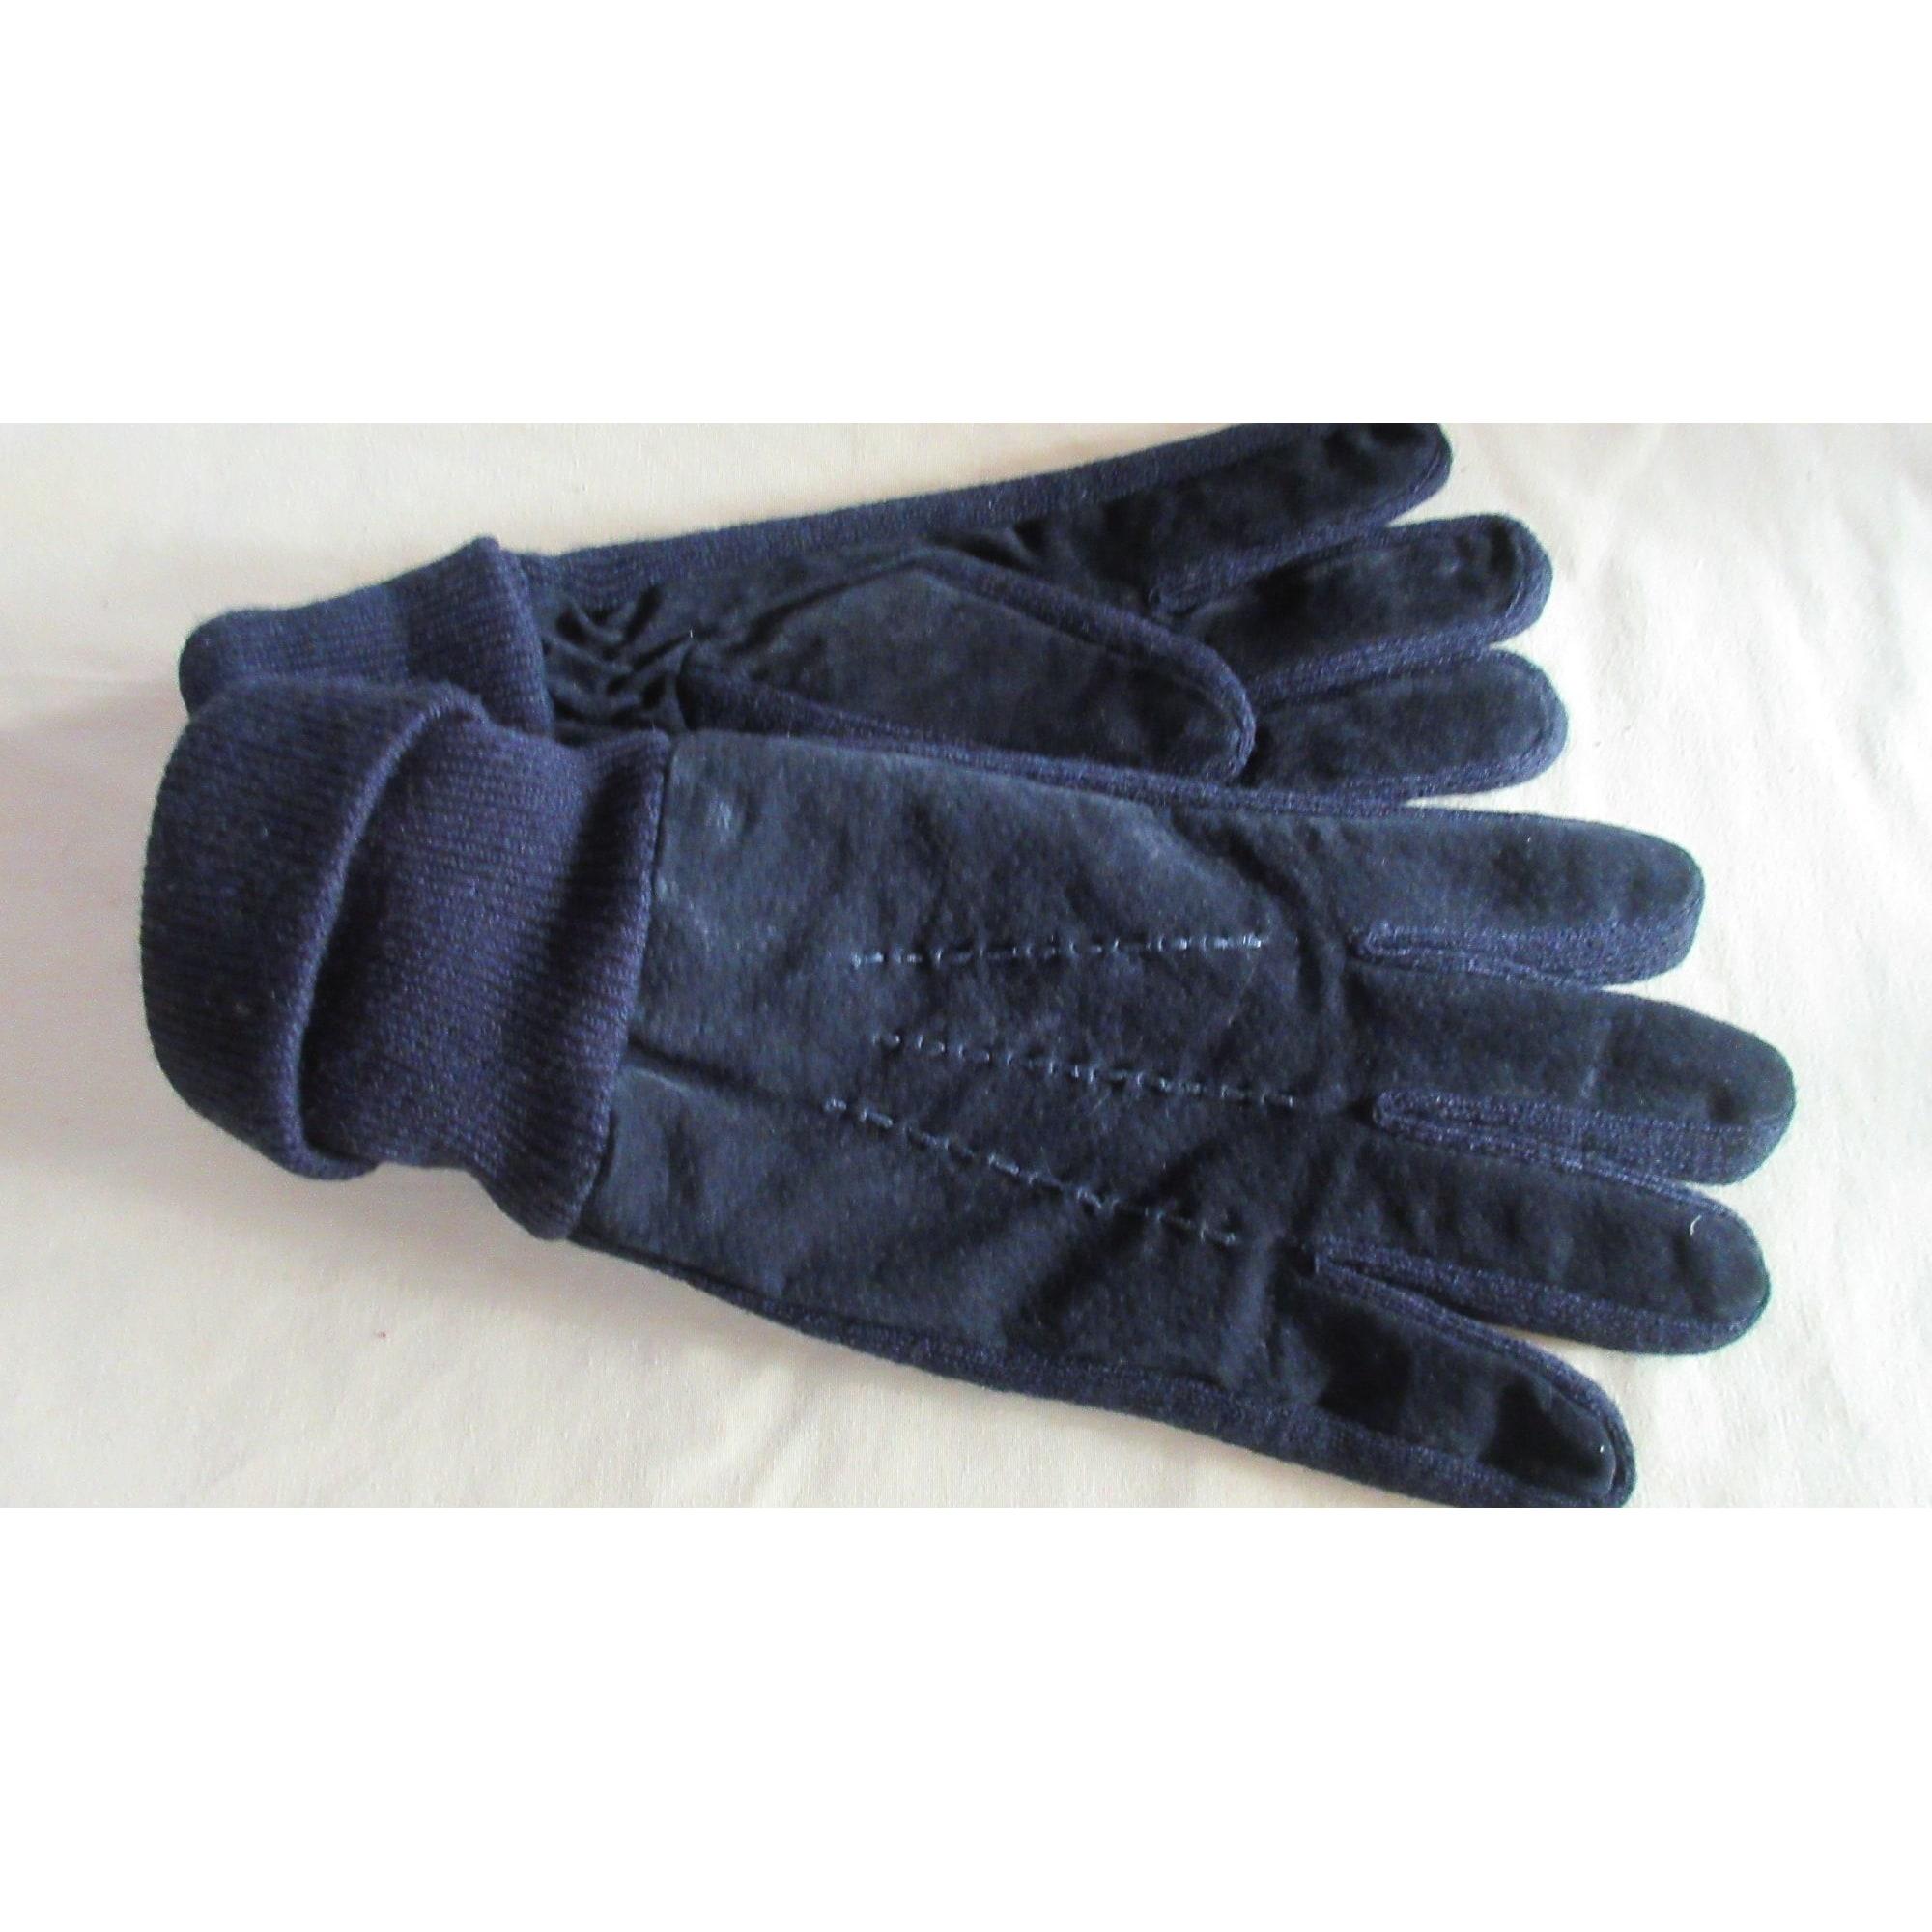 Handschuhe PRINTEMPS HOMME Schwarz